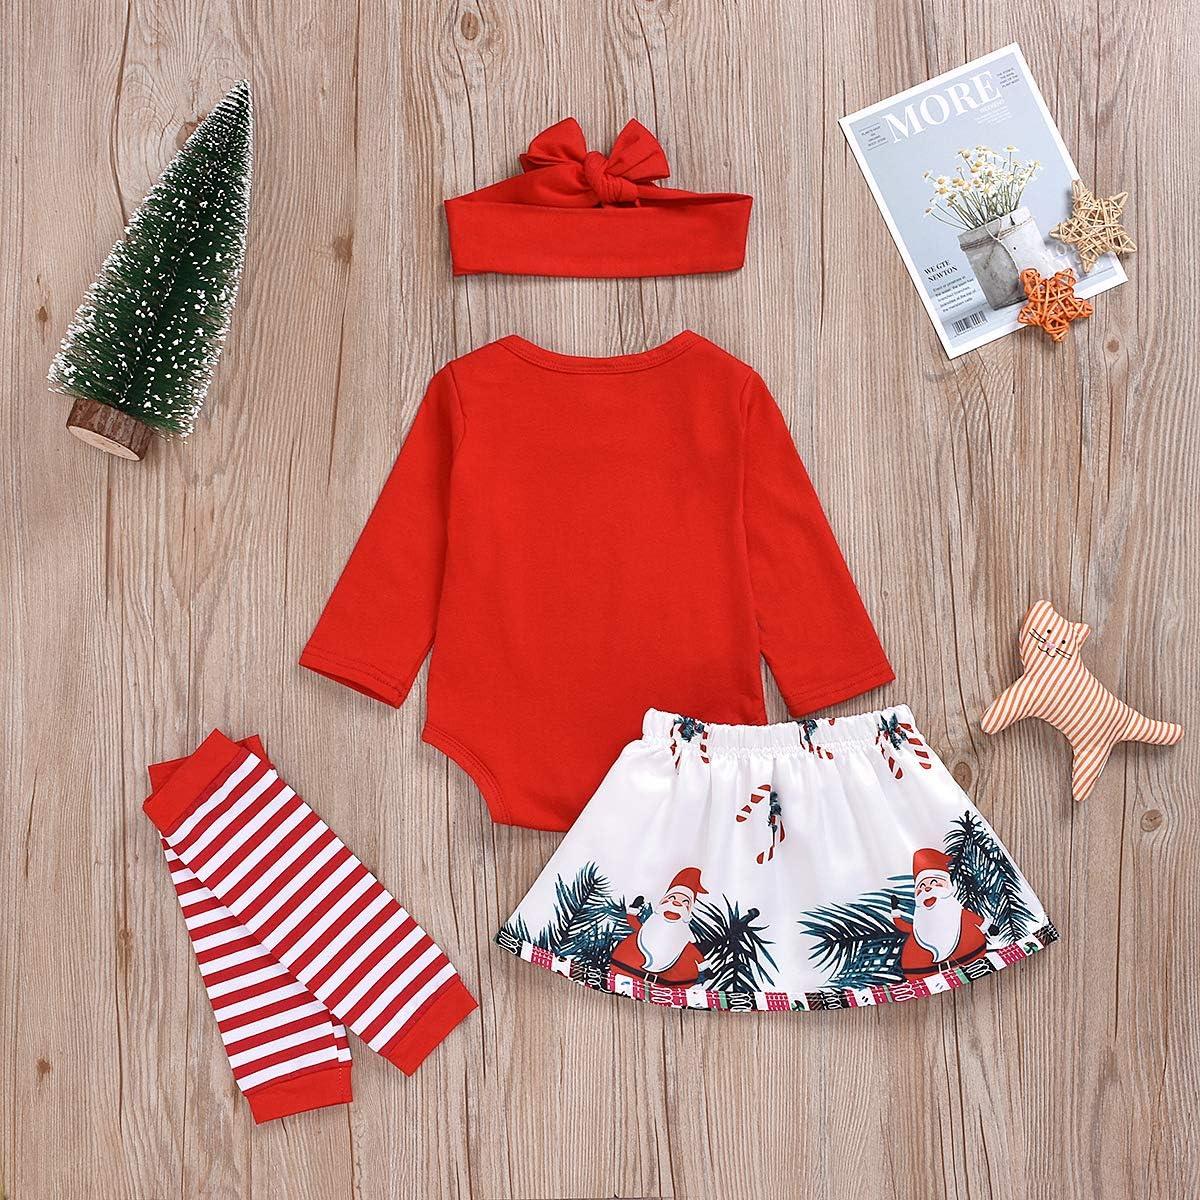 Christmas 3PCs Toddler Infant Baby Girl My 1st Christmas Red Romper Bodysuit Newborn Skirt Outfits Set